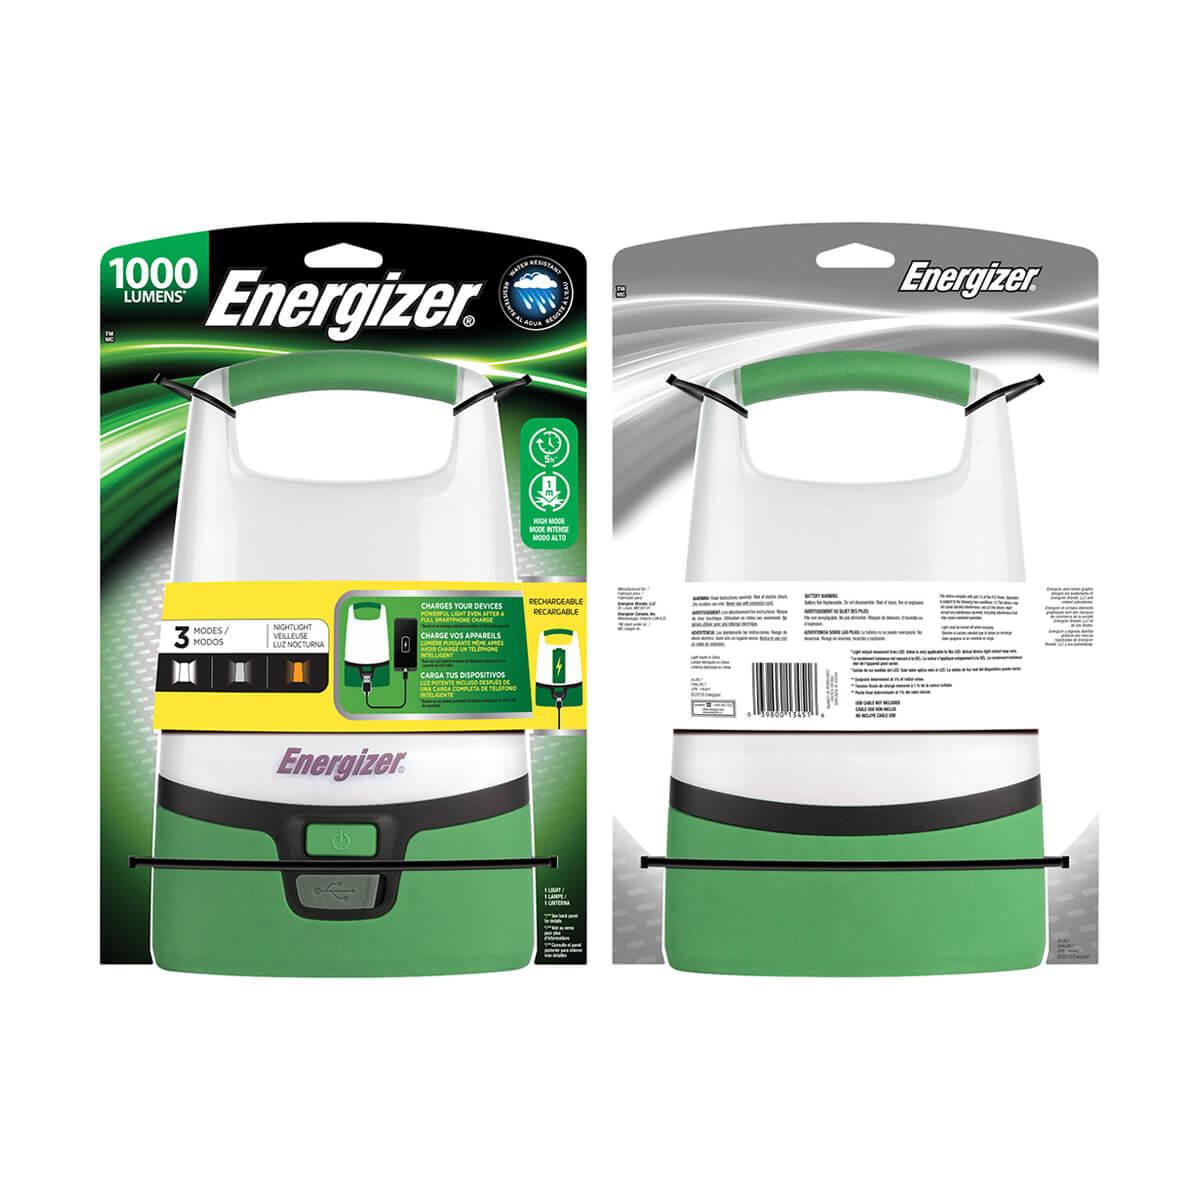 Energizer LED Rechargeable Lantern - 1000 Lumens